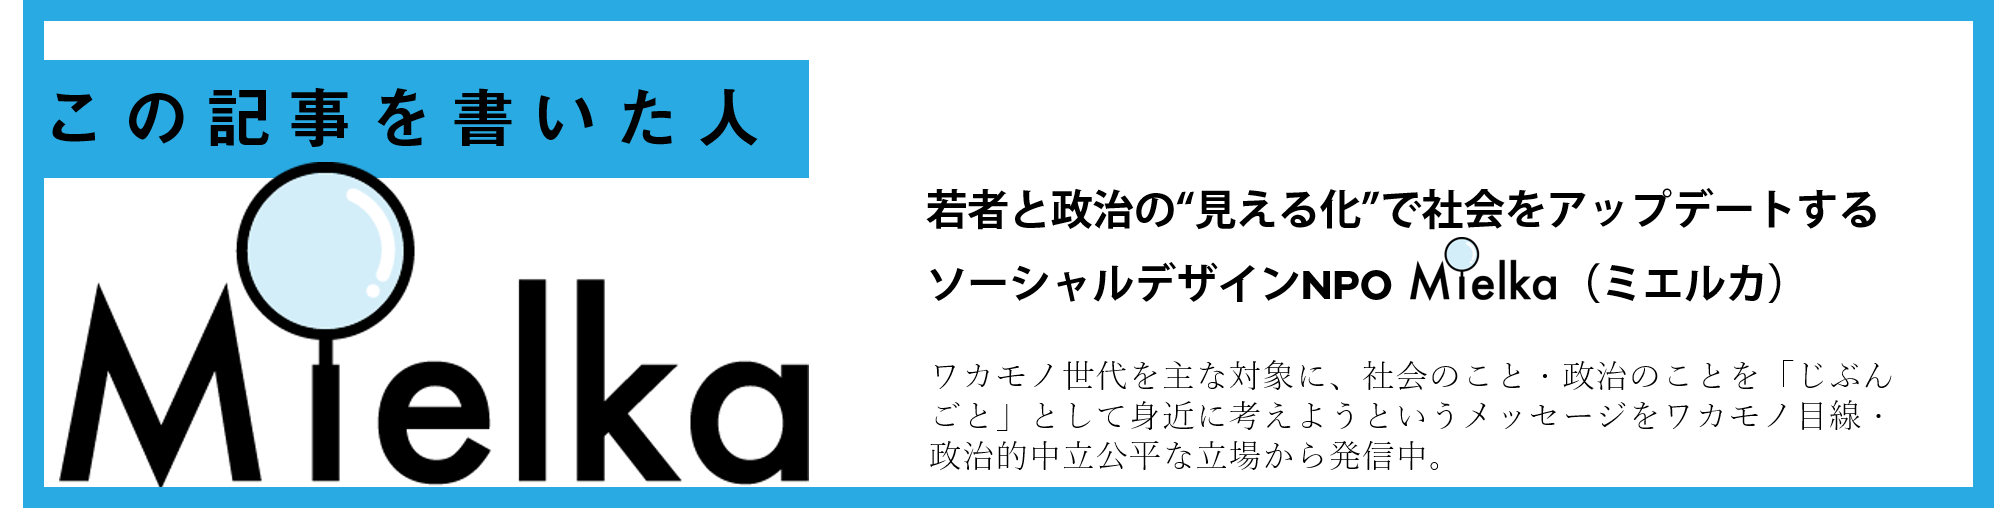 3098b23716f5a73744d6d610c7025dde - 【安保法制】公約比較-15の争点- 2017衆議院議員総選挙